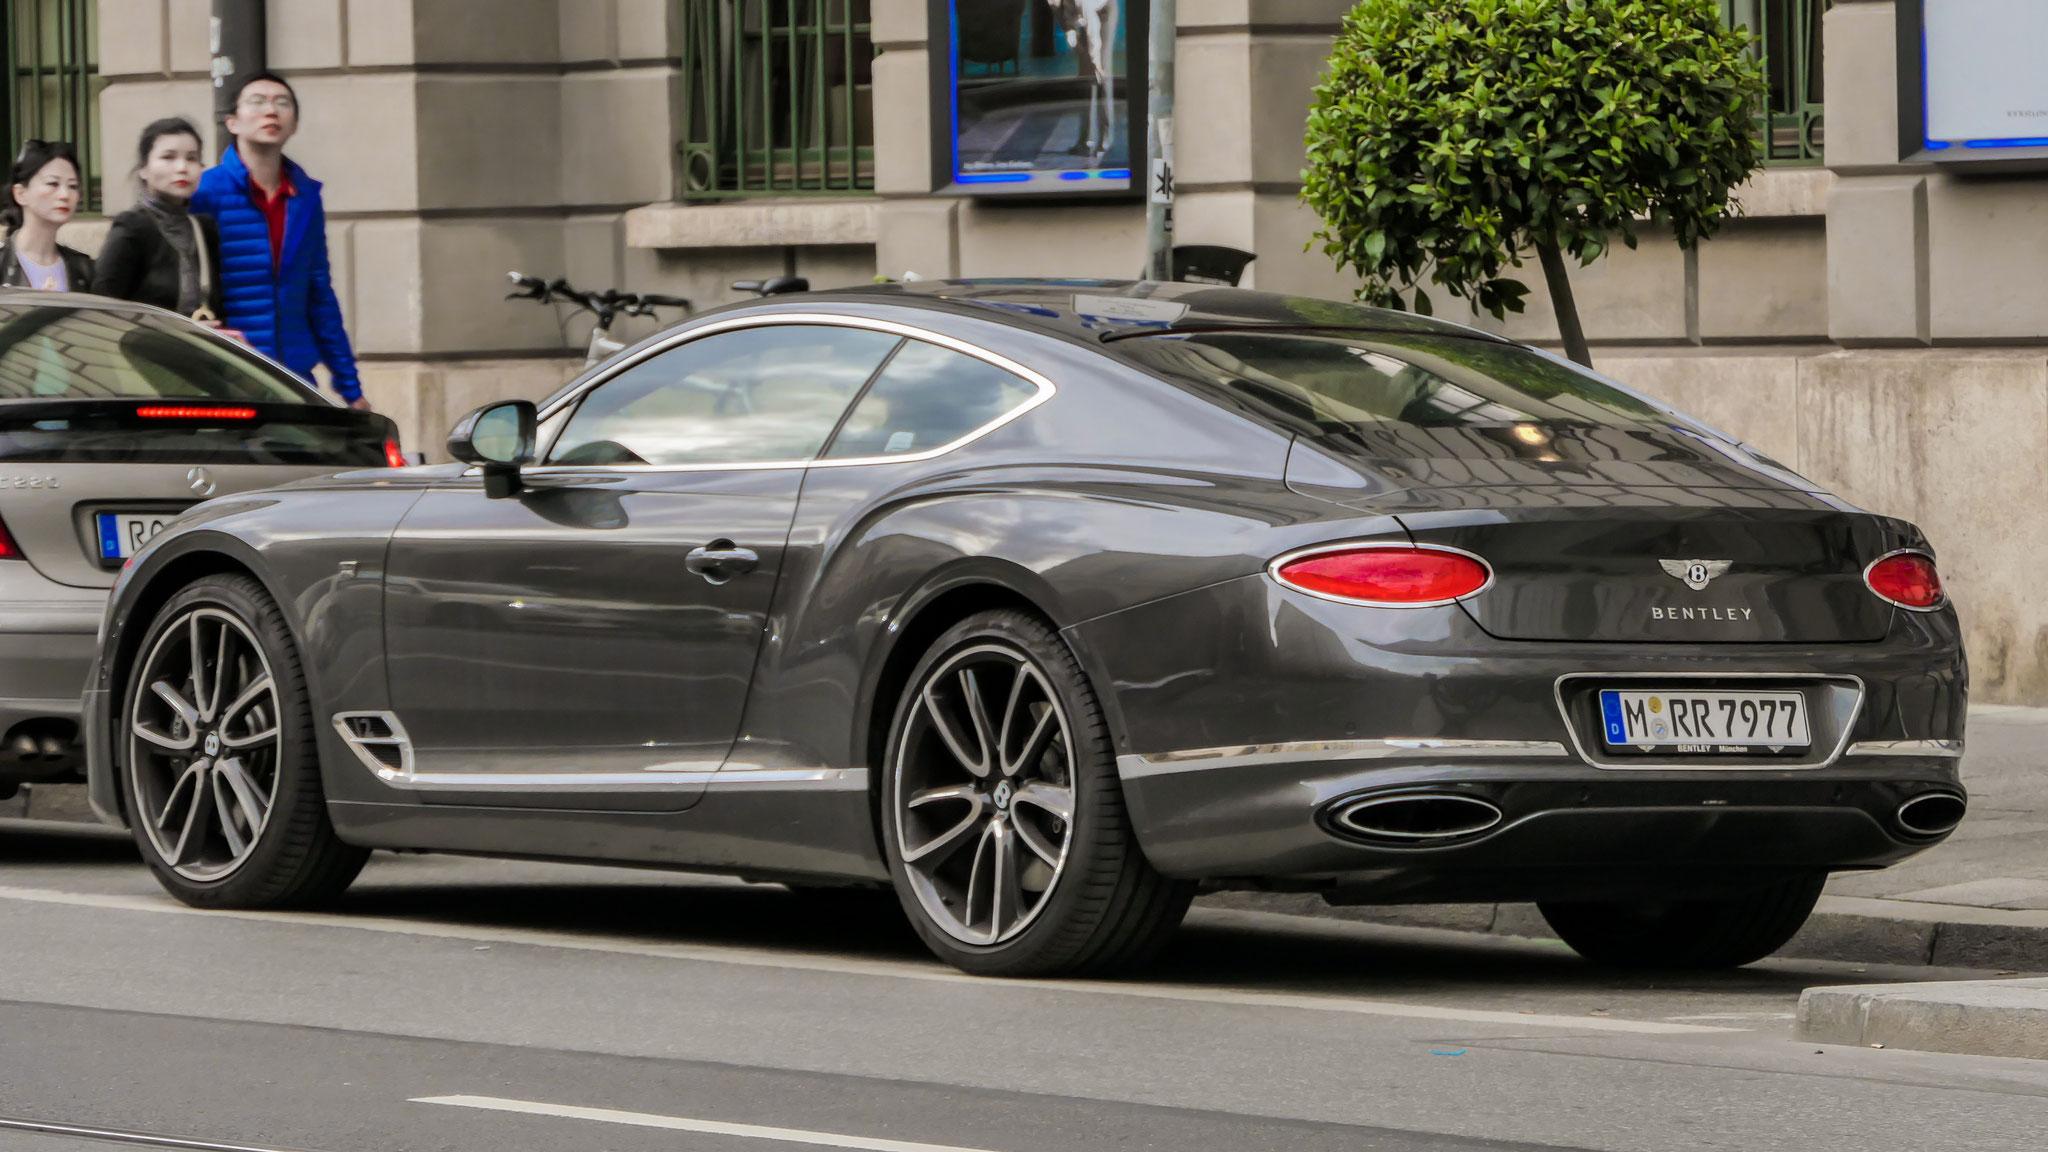 Bentley Continental GT - M-RR-7977